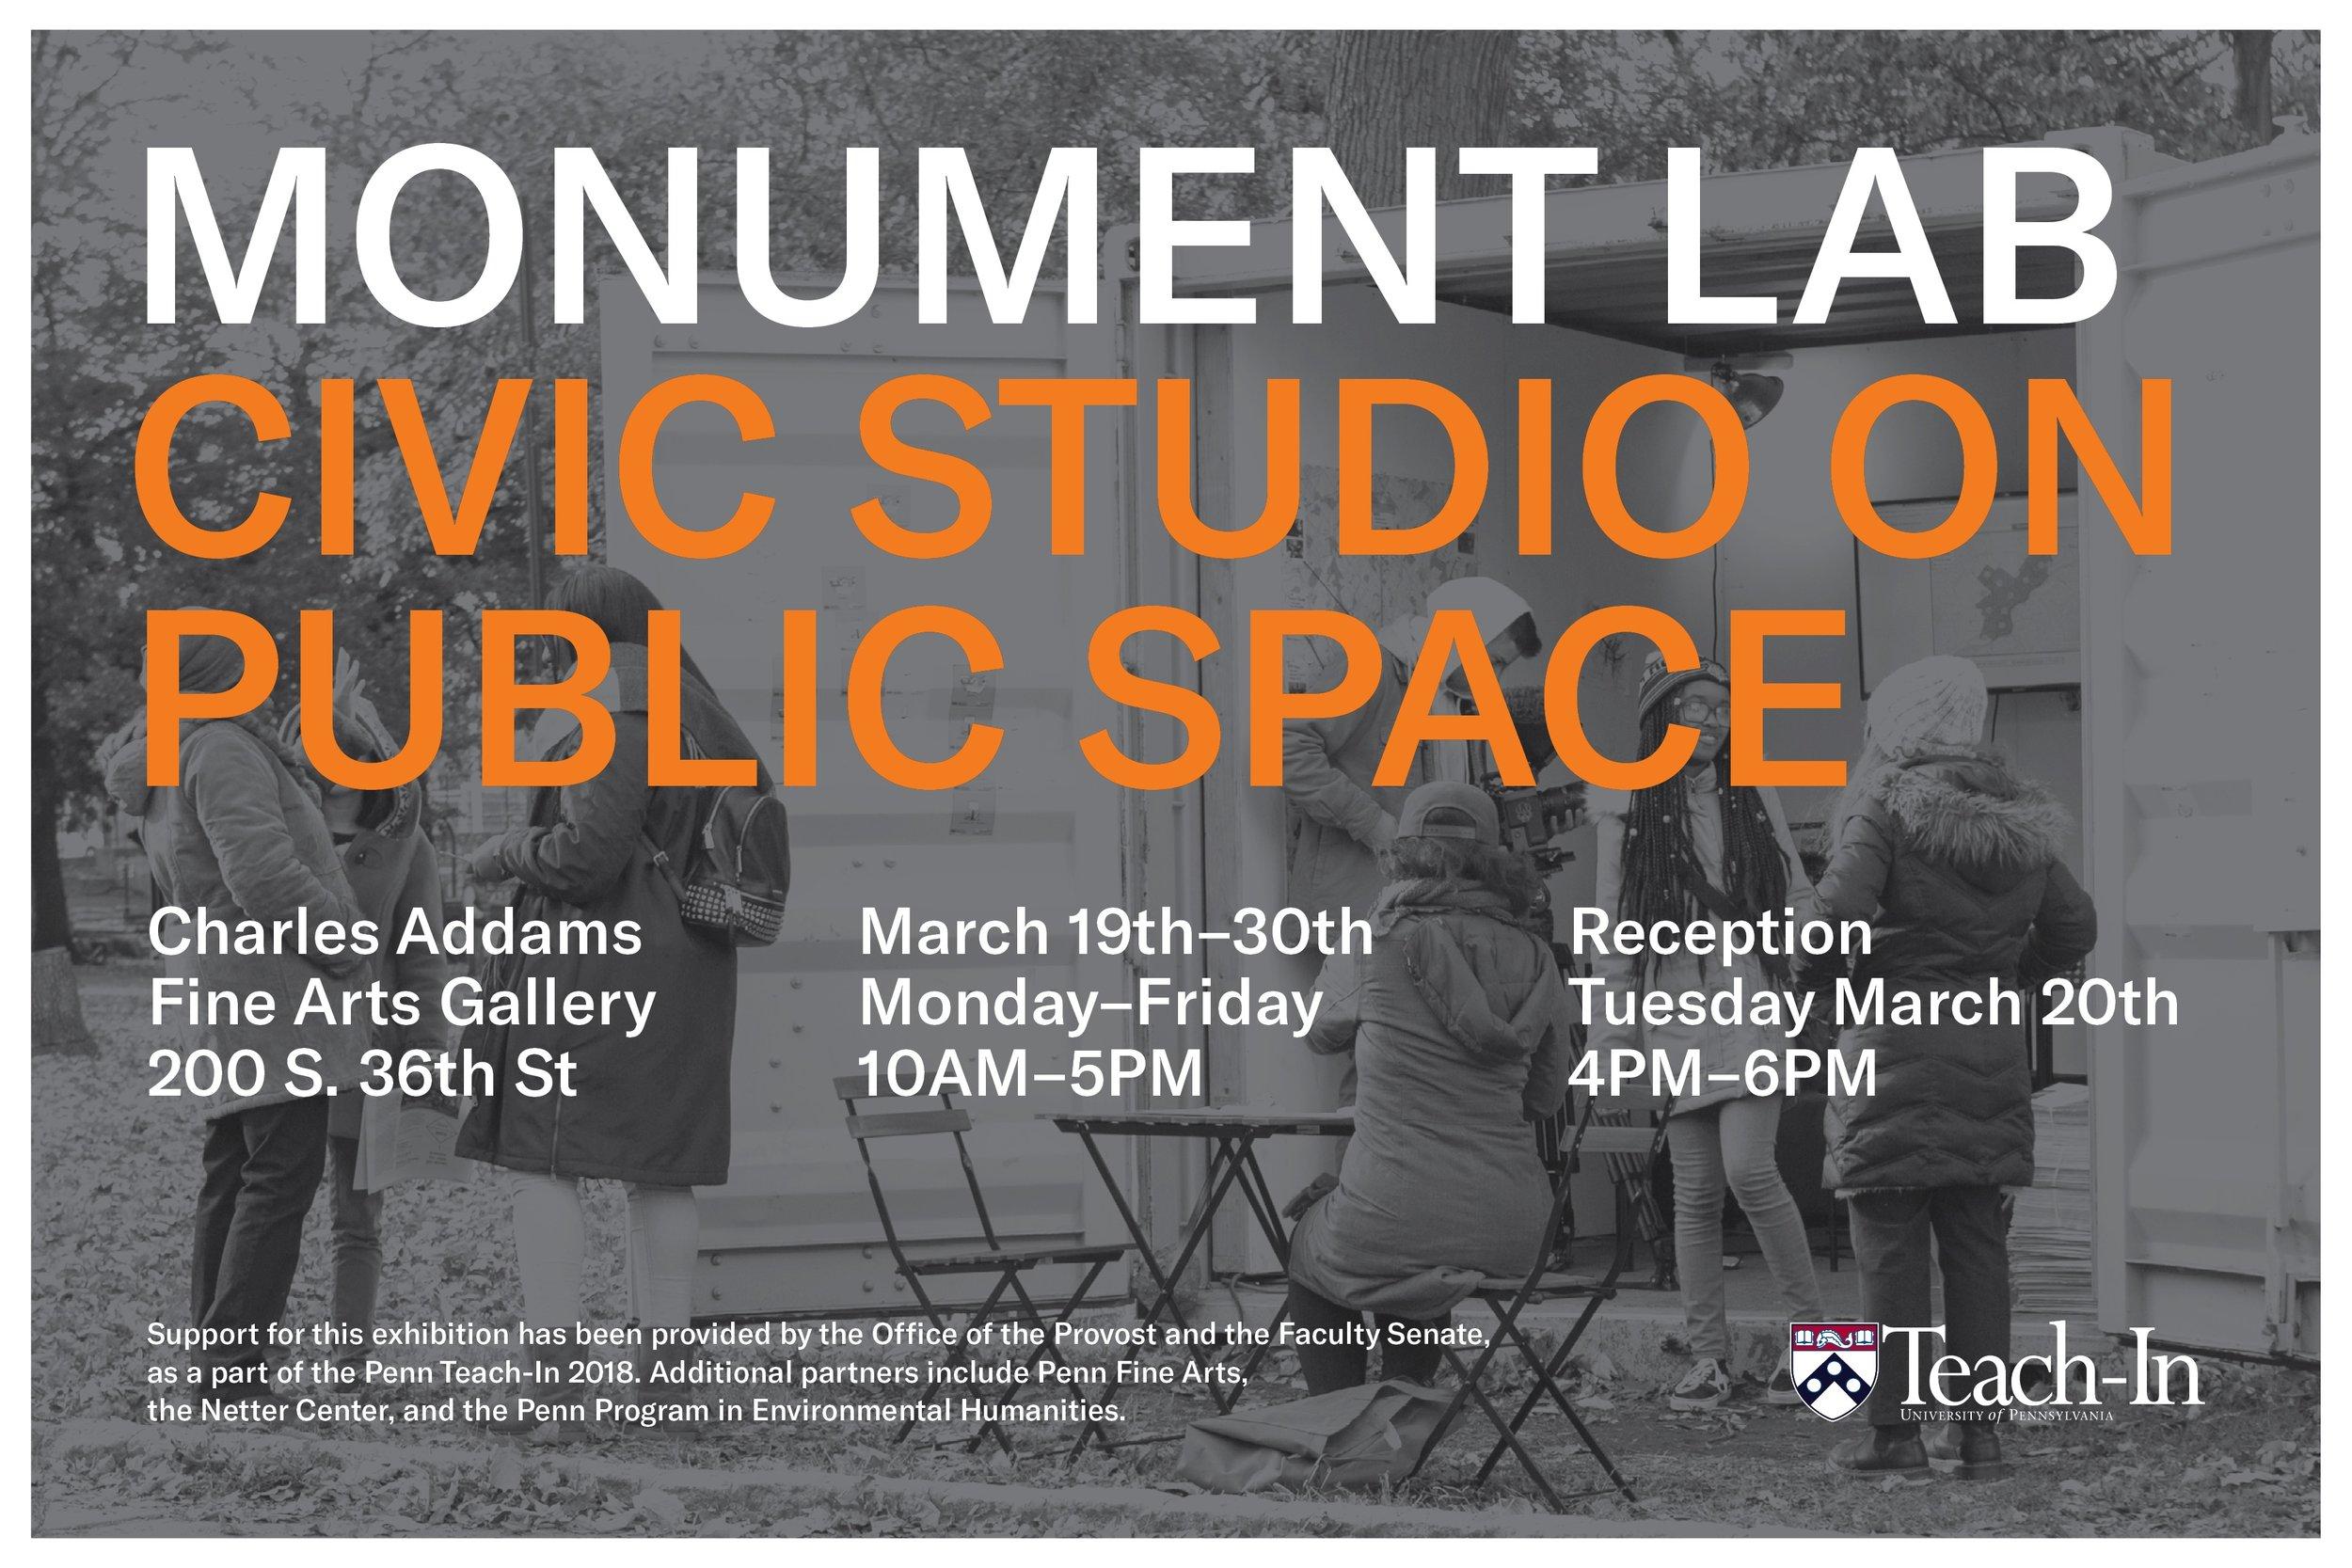 Civic Studio on Public Space Philadelphia, Pennsylvania